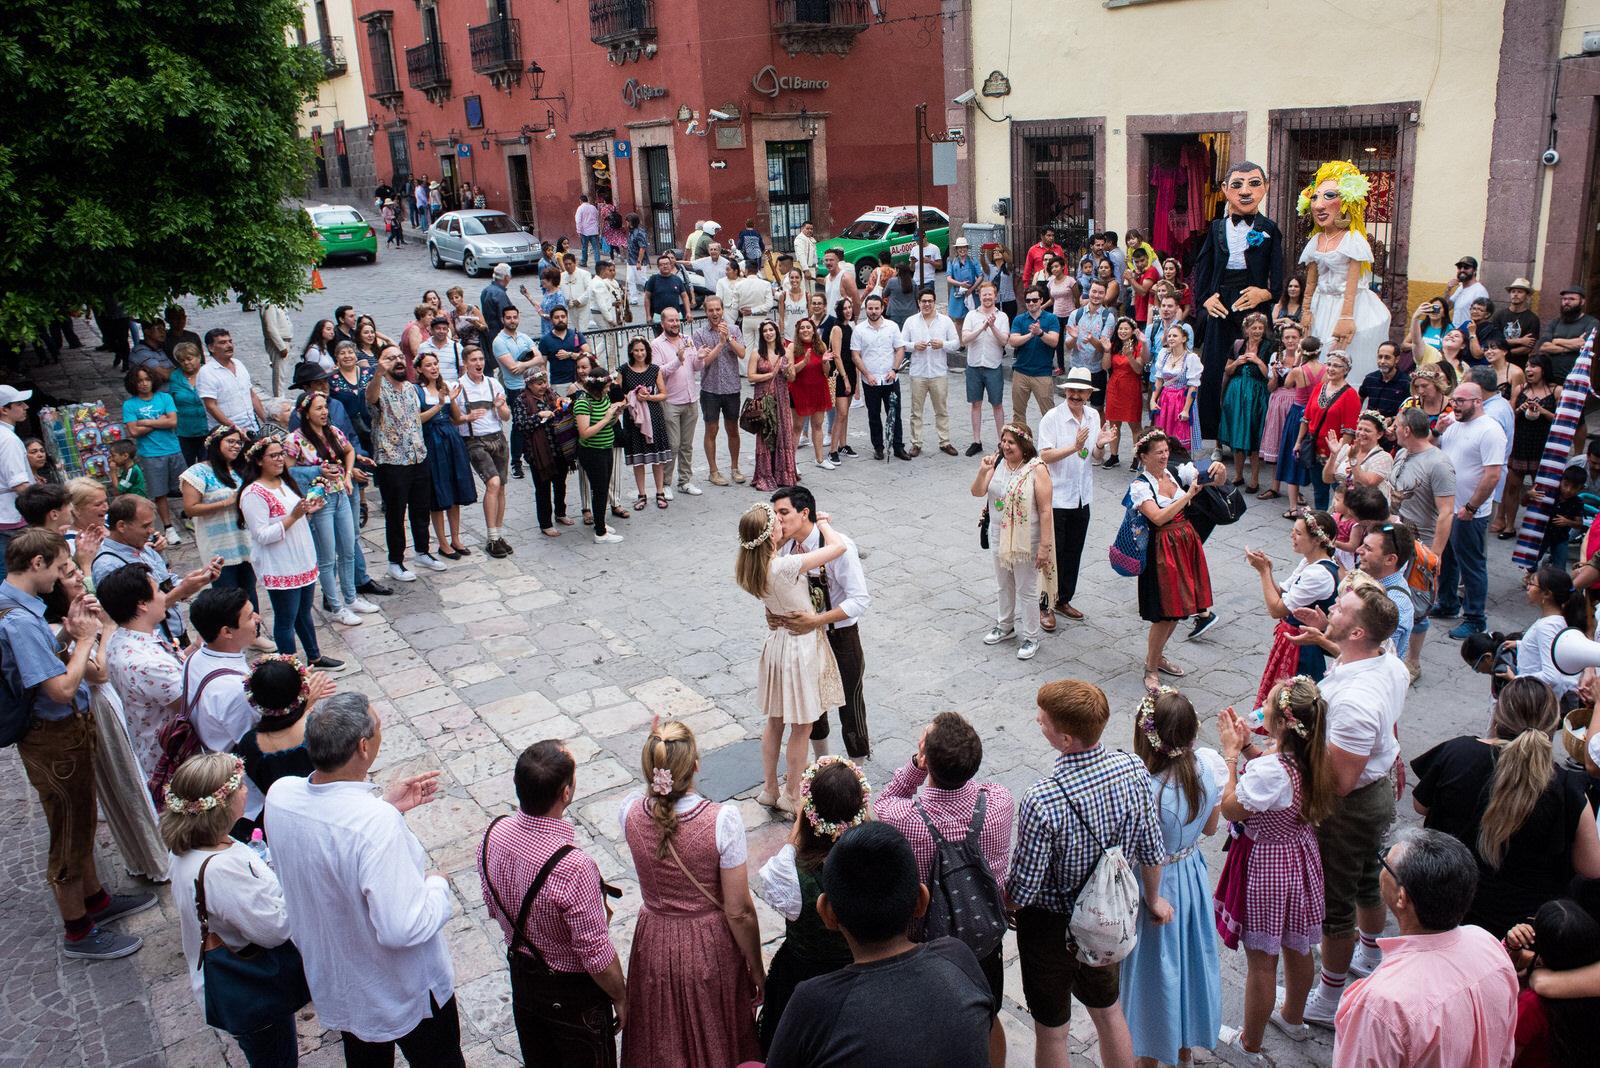 callejoneada_san_miguel_de_allende_wedding_photography_ (15).jpg